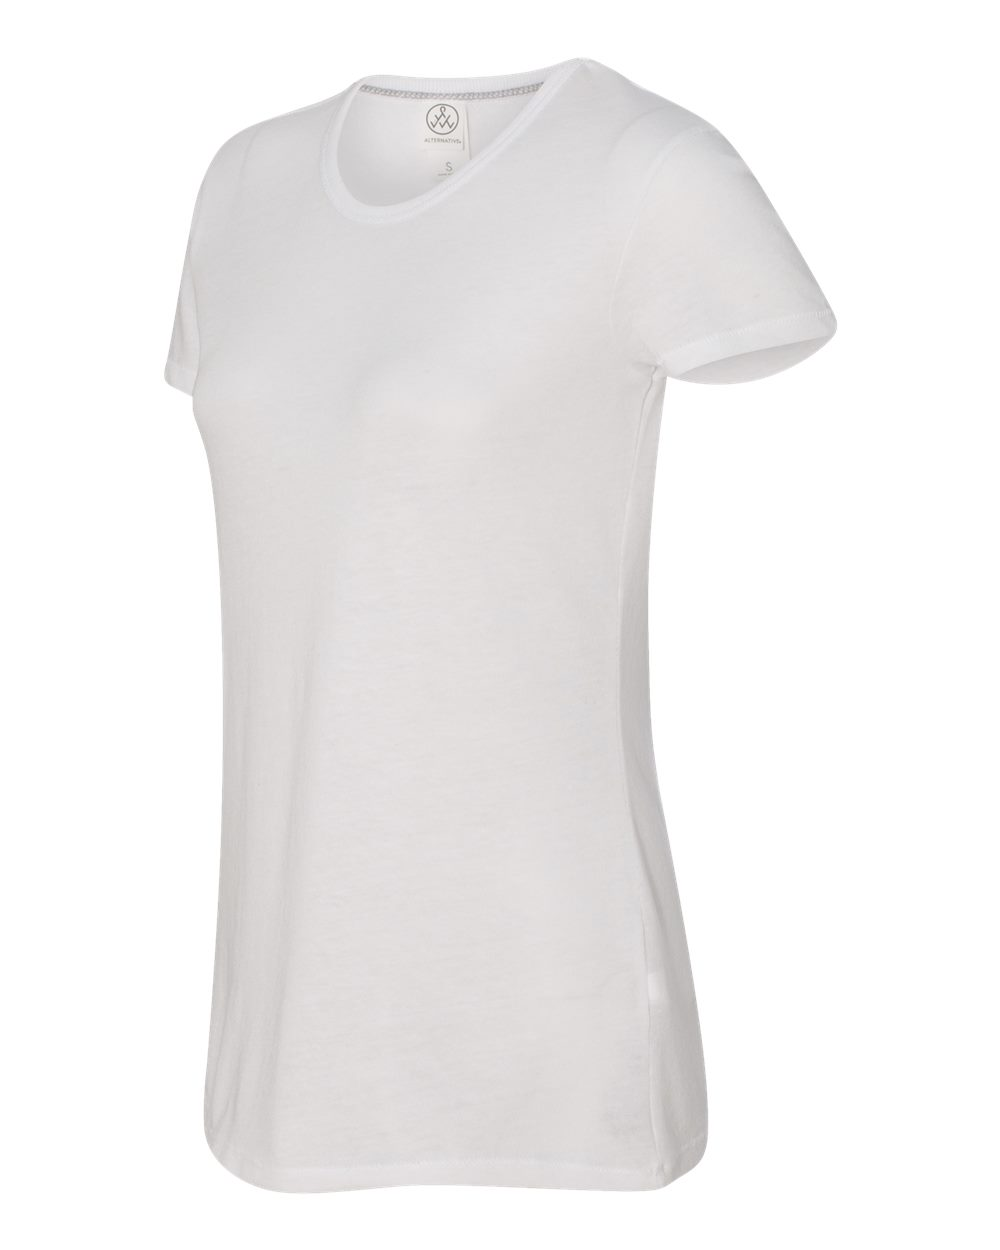 Alternative 5052 - Women's Vintage 50/50 Jersey Keepsake T-Shirt